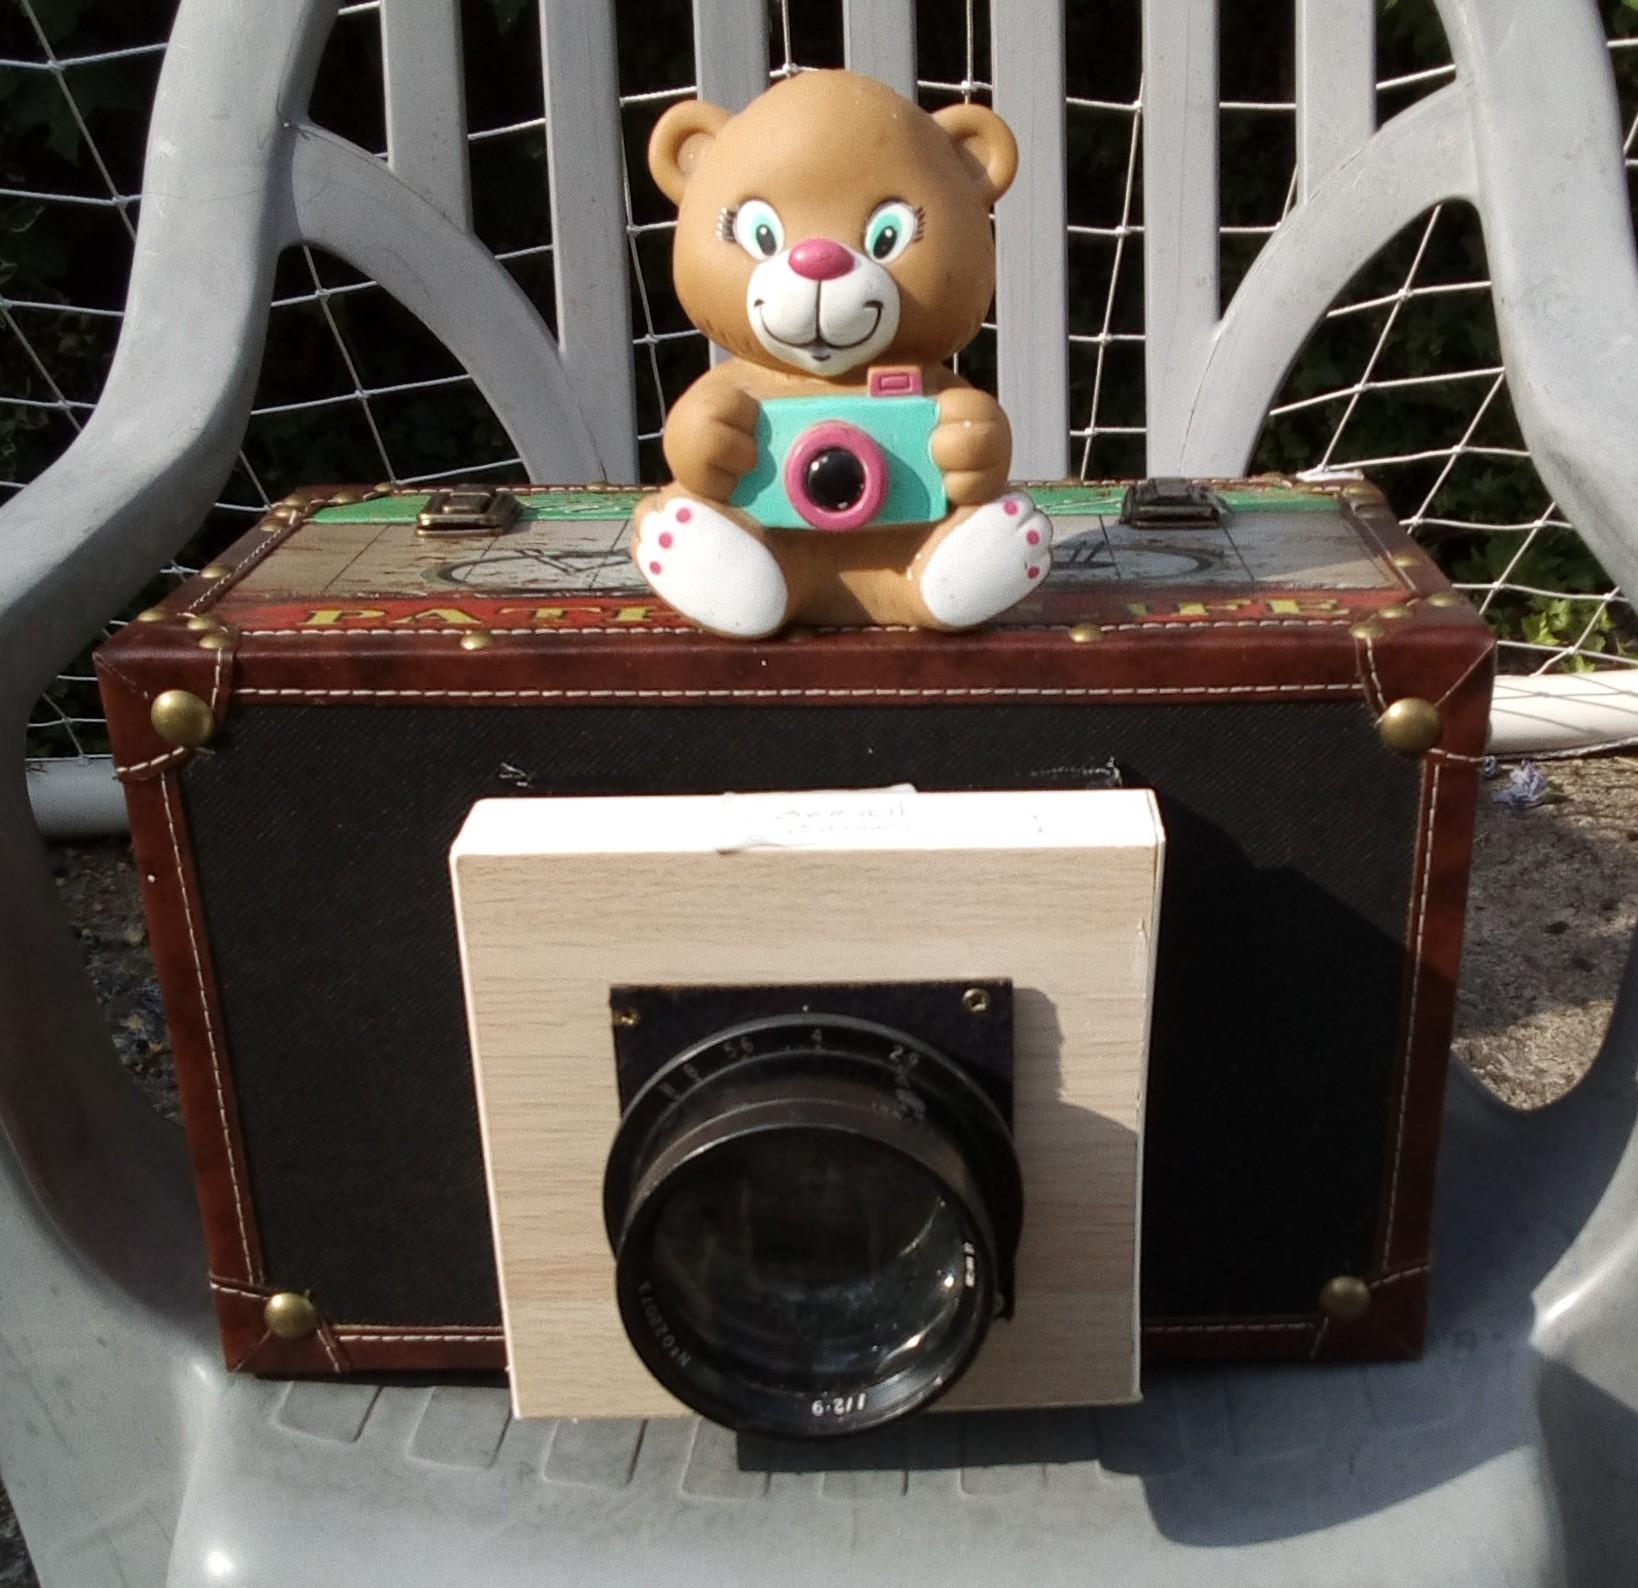 Bear and camera